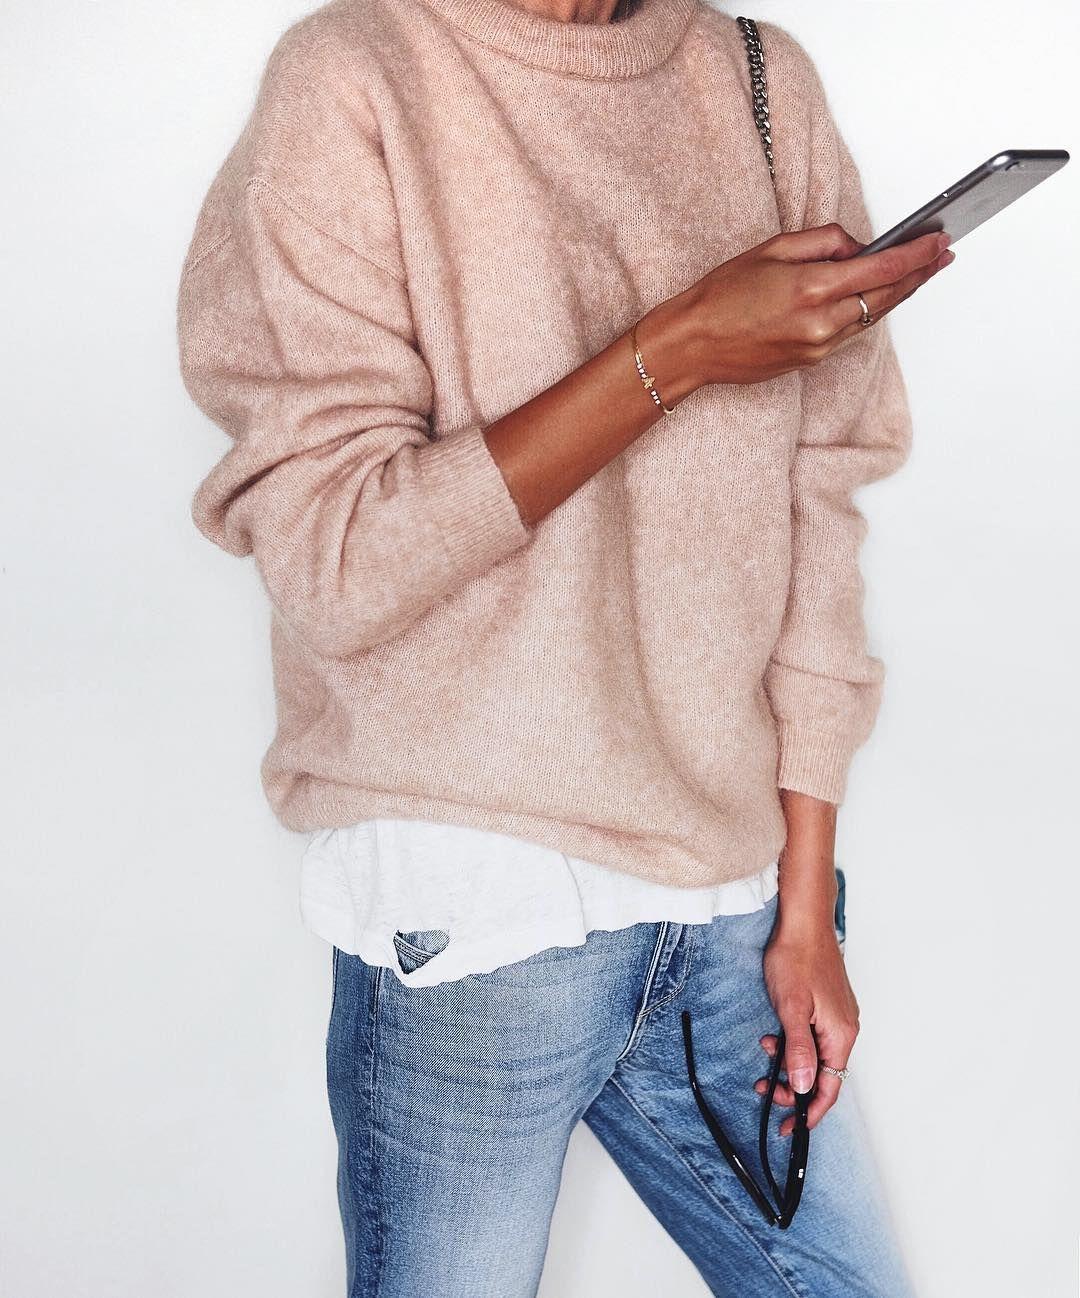 Acne Studios pink melange mohair jumper, blue jeans, white t-shirt ...